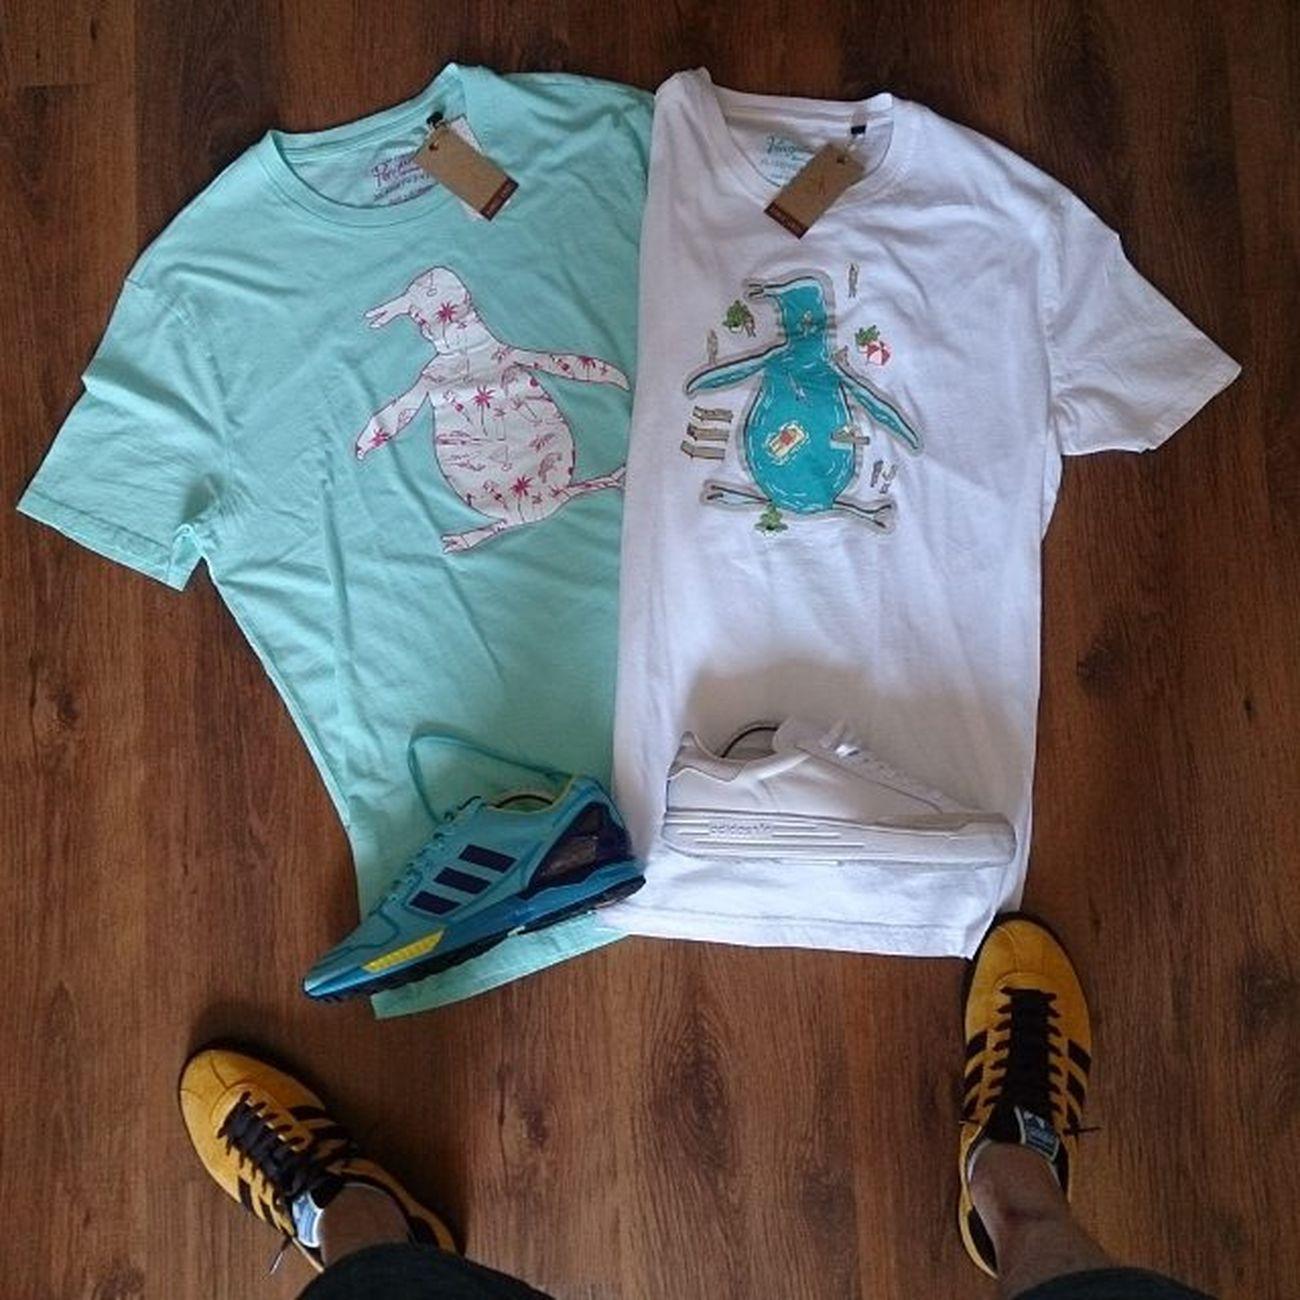 Todayspurchase couple of Anoriginalpenguin tshirt to match with da Adidaszxaqua and Adidasrodlaver 👊👏 Casualclobber Supercasual_ Matchdayclobber Matchdaymadness Awaydaymadness Awaydayclobber